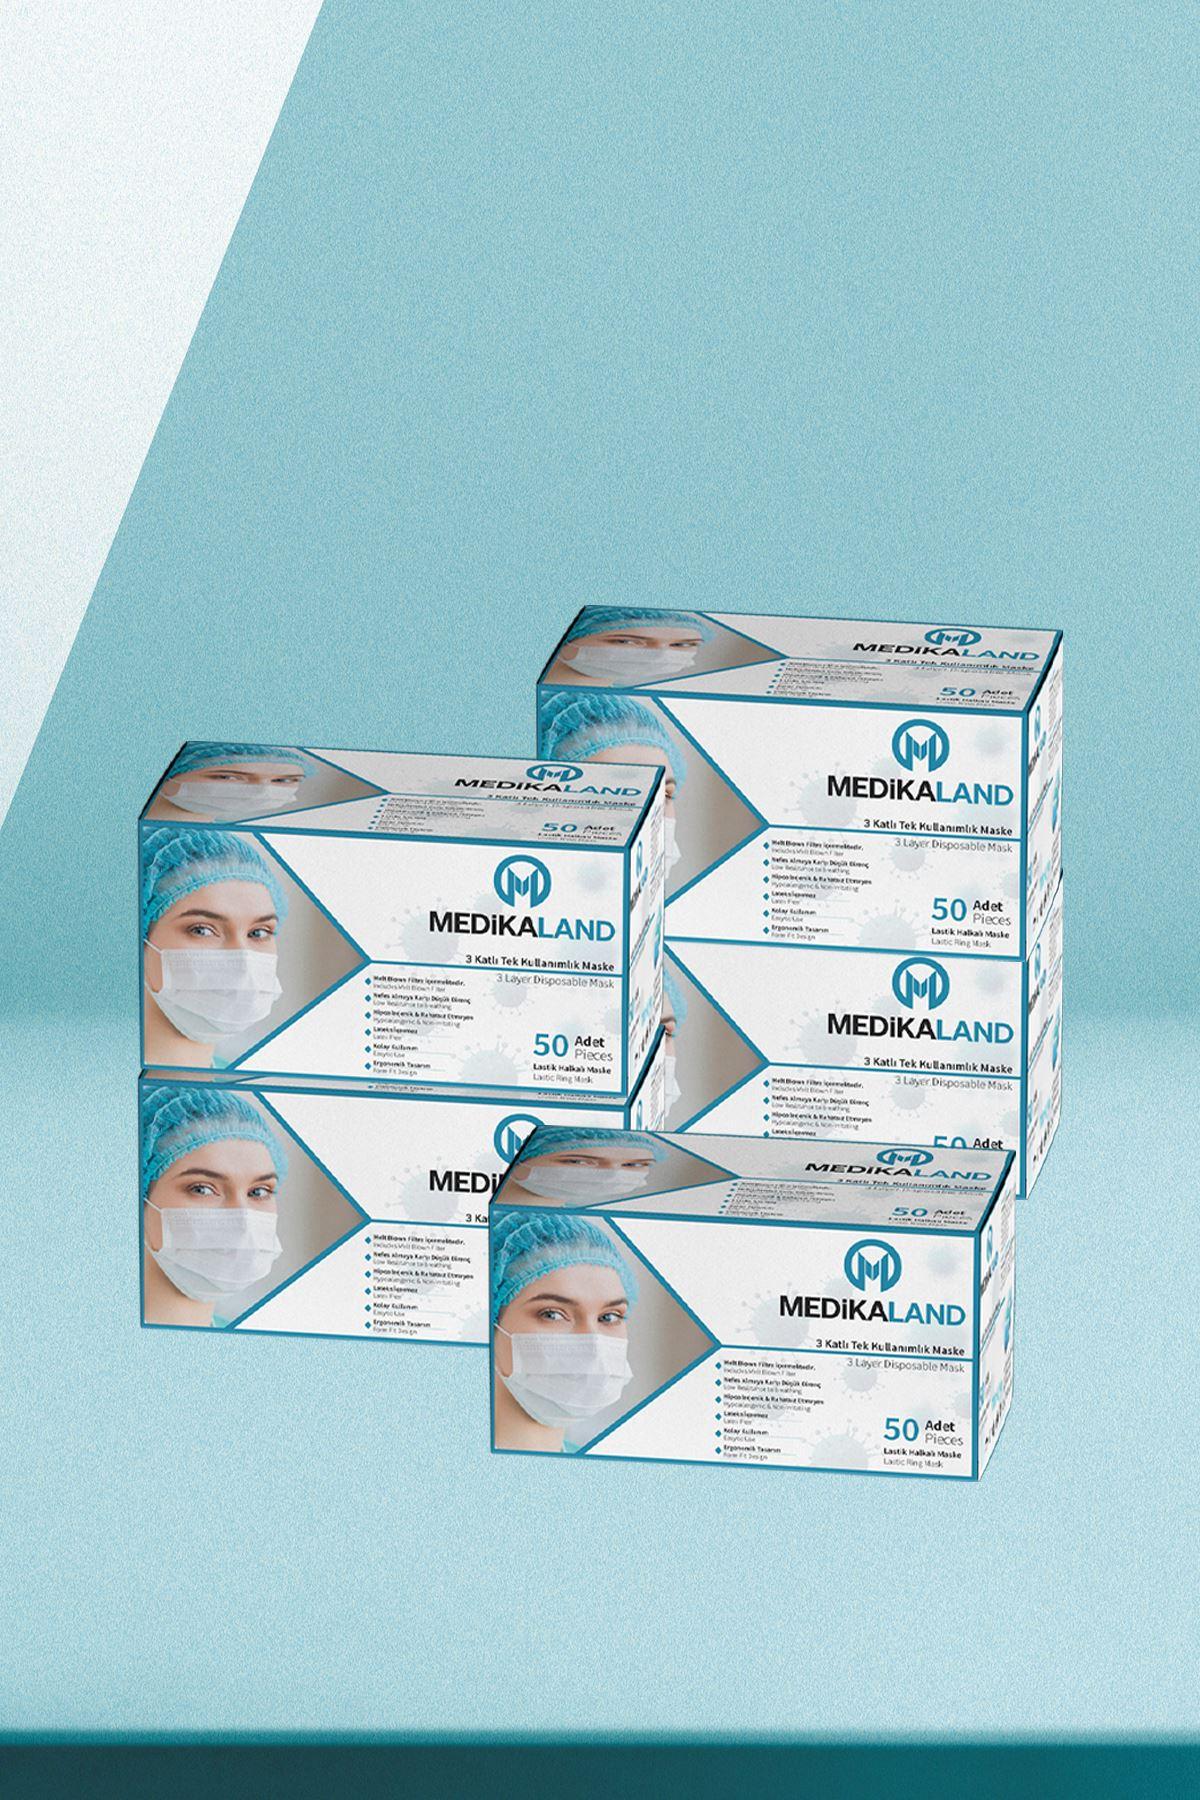 Medikaland 3 Katlı Spunbond Tek Kullanımlık Medikal Maske 5 x 50'li Paket Beyaz